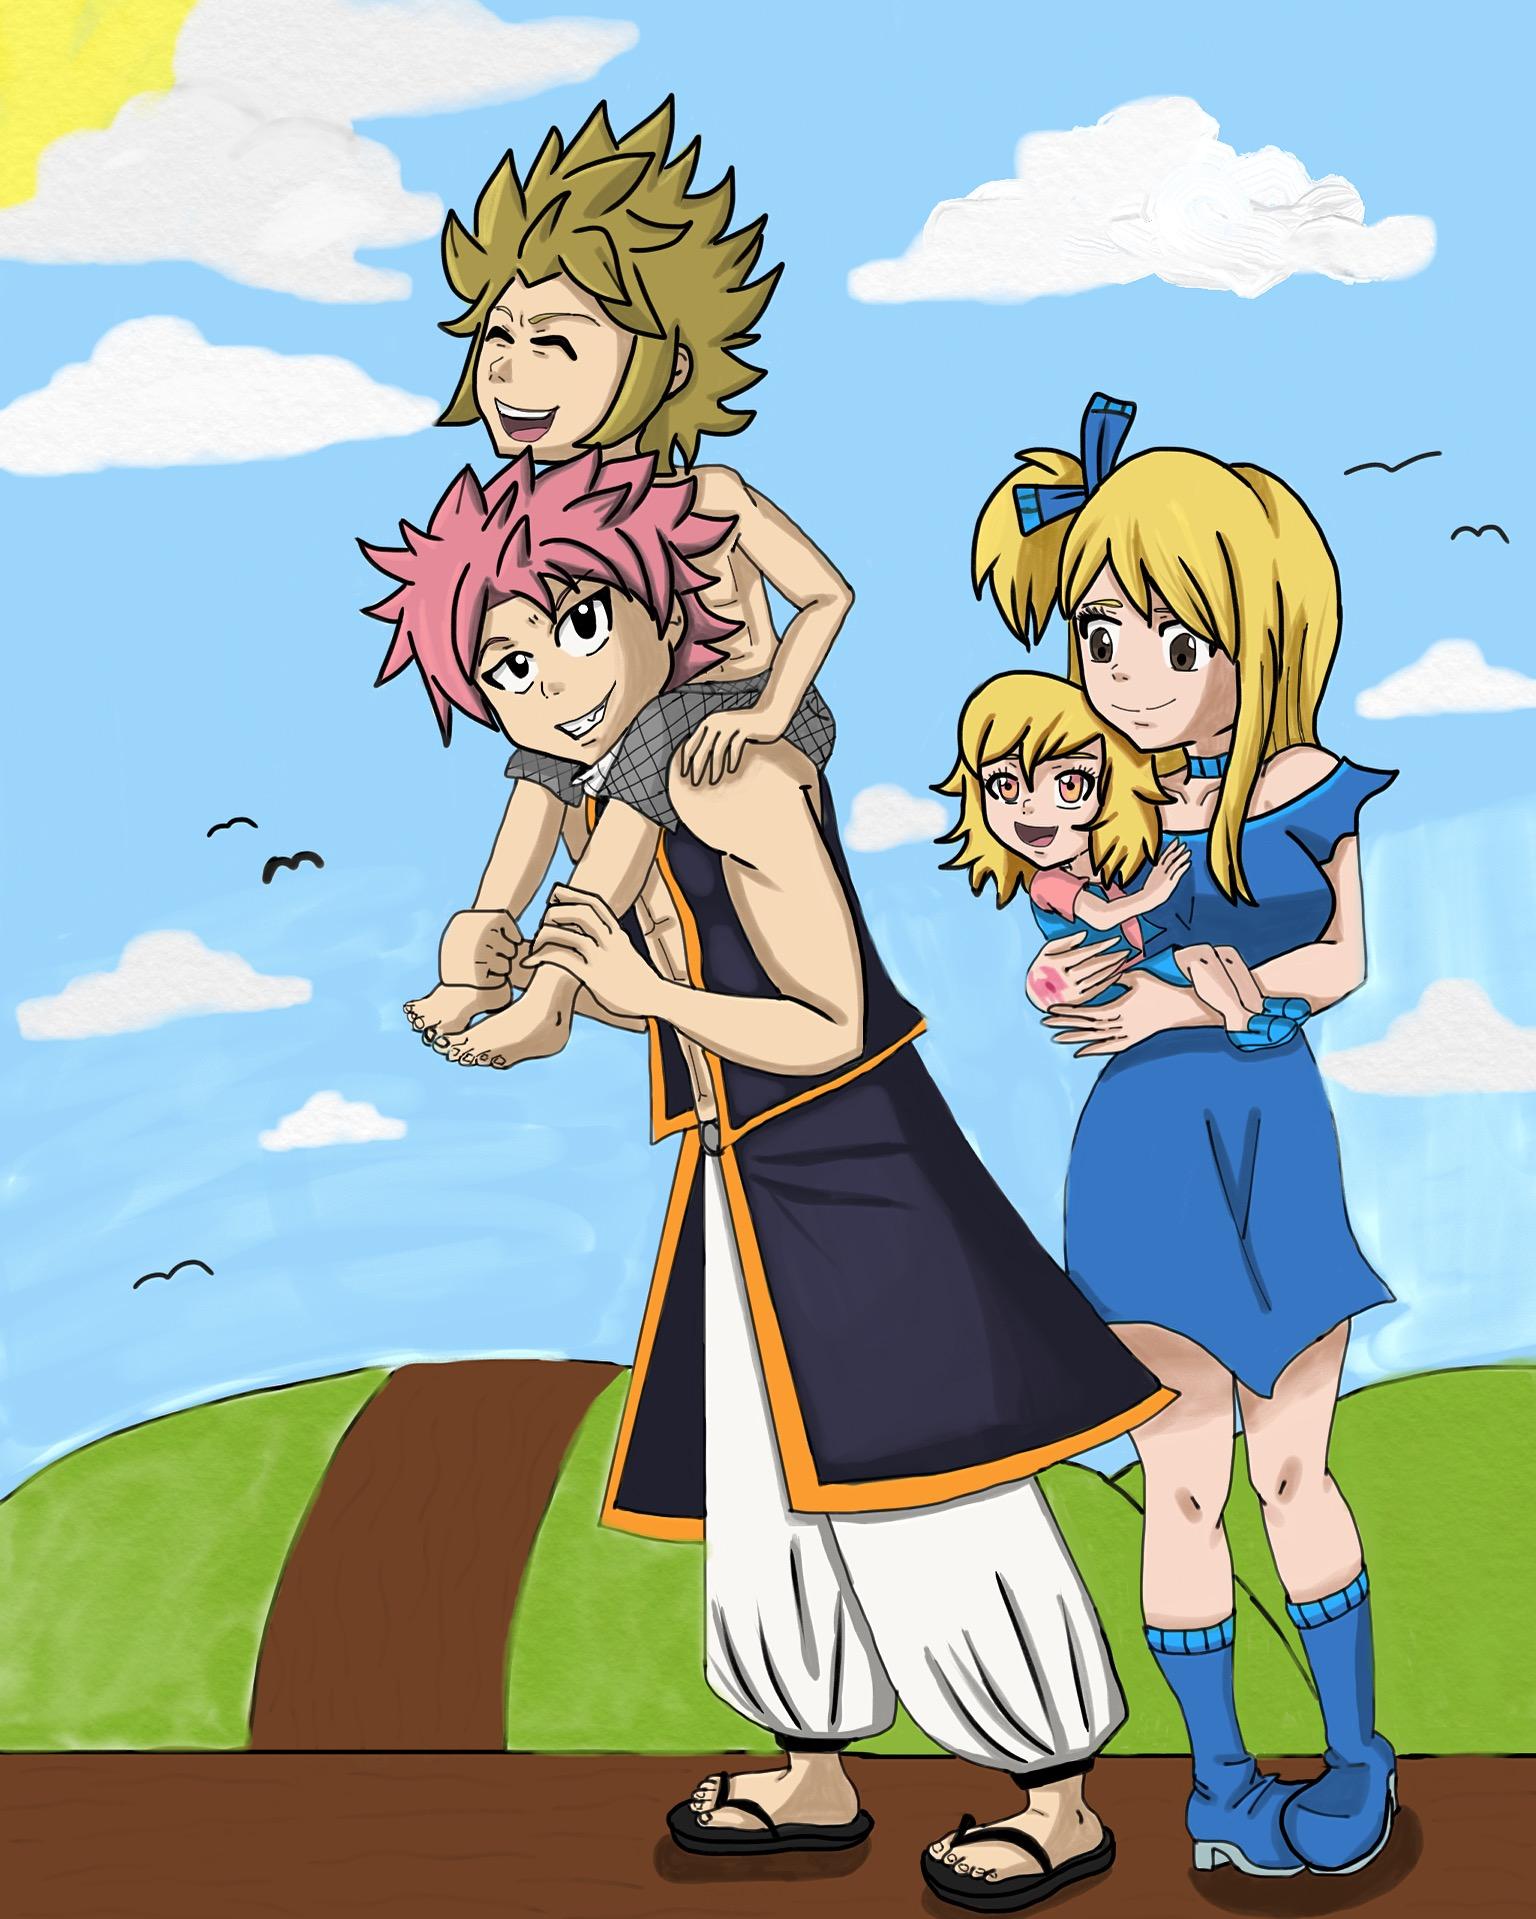 Nalu Family (Natsu X Lucy) by Karyf321 on DeviantArt